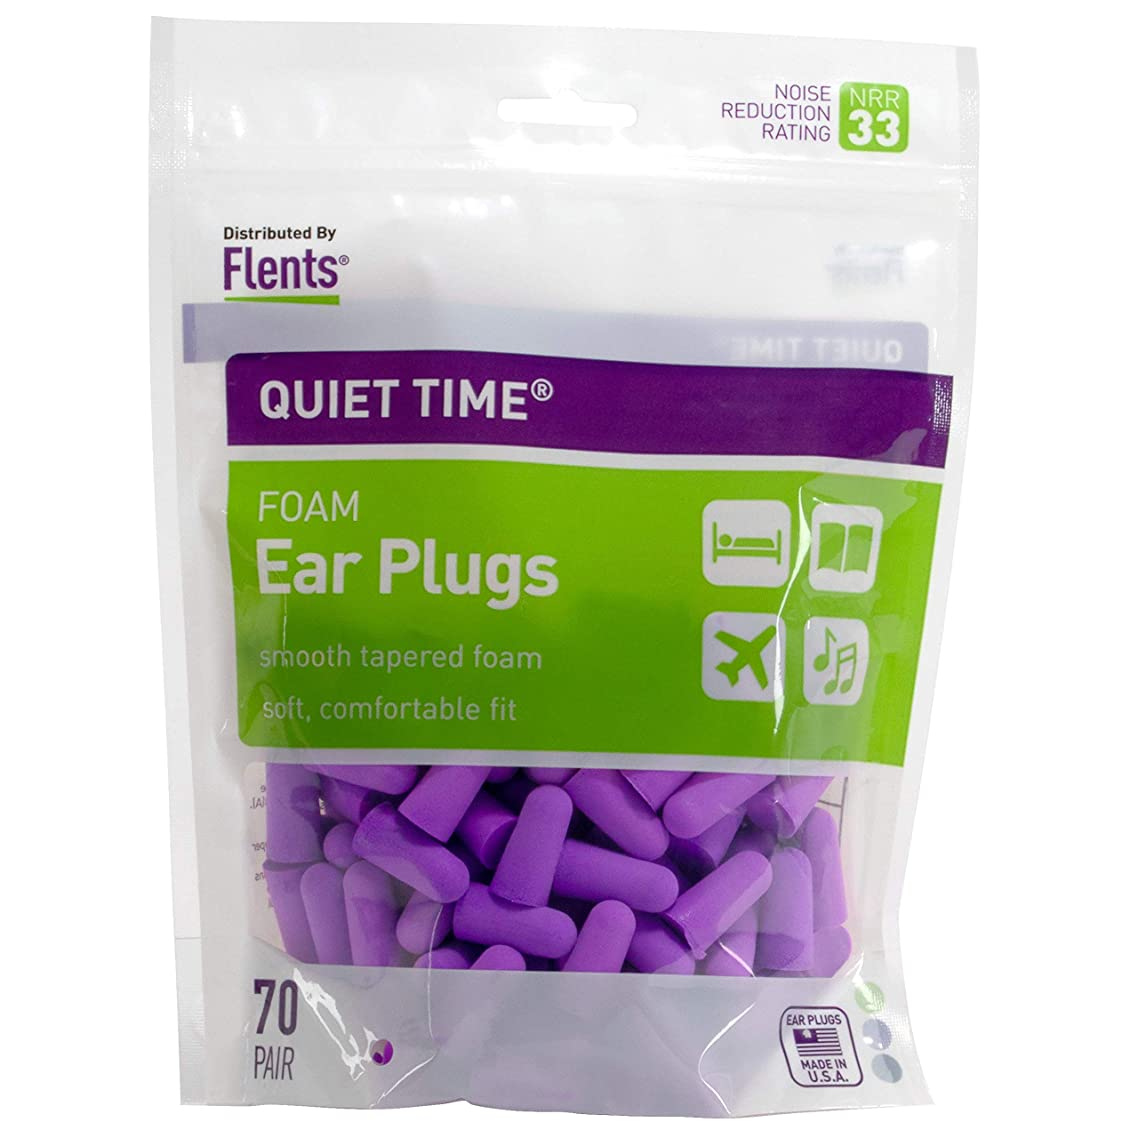 Flents Quiet Time Ear Plugs/Earplugs | 70 Pair Bonus Pack | NRR 33